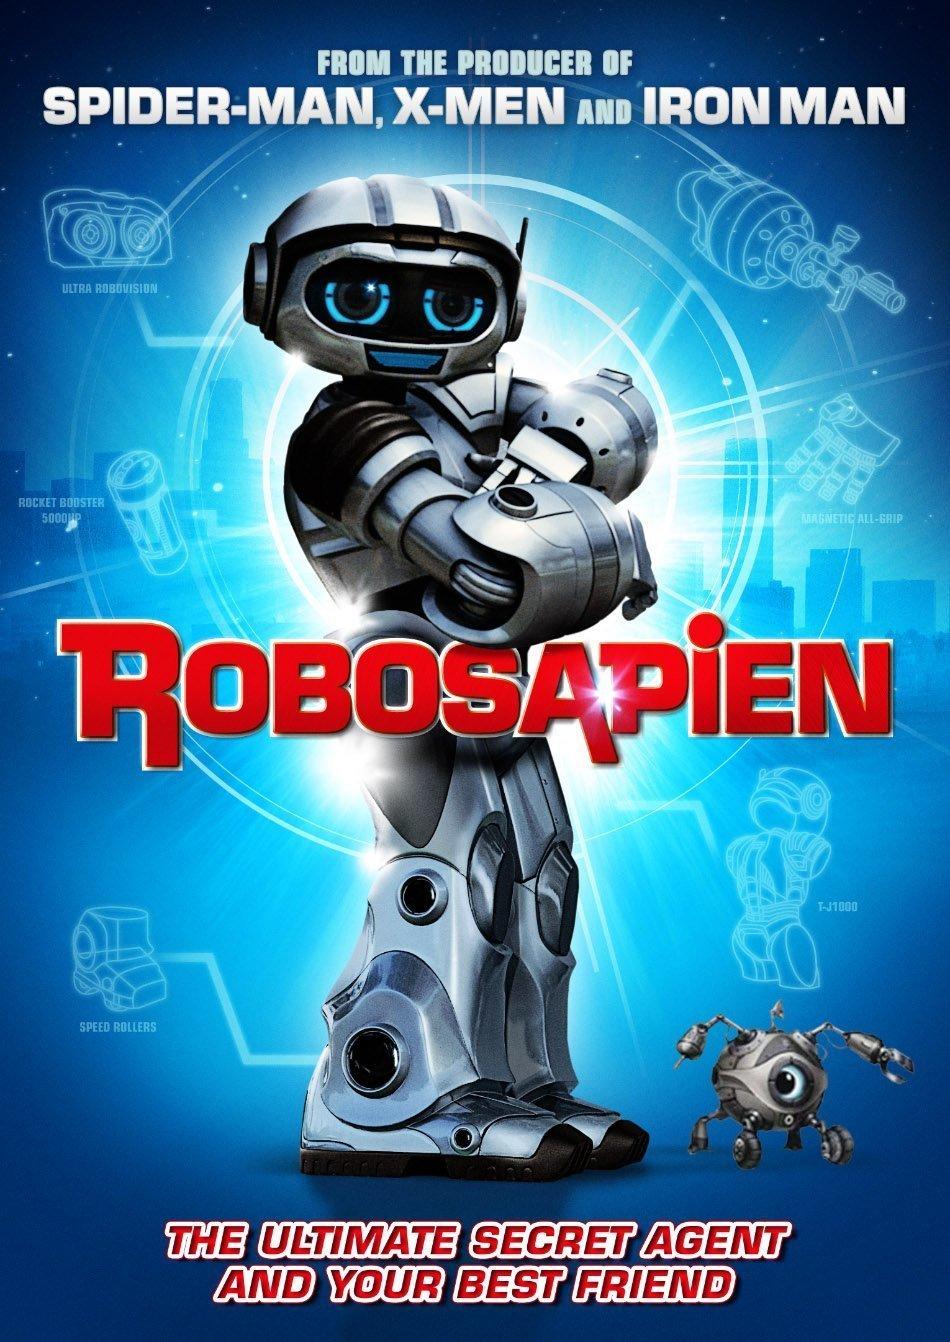 Robosapien rebooted 2013 pelicula hd online